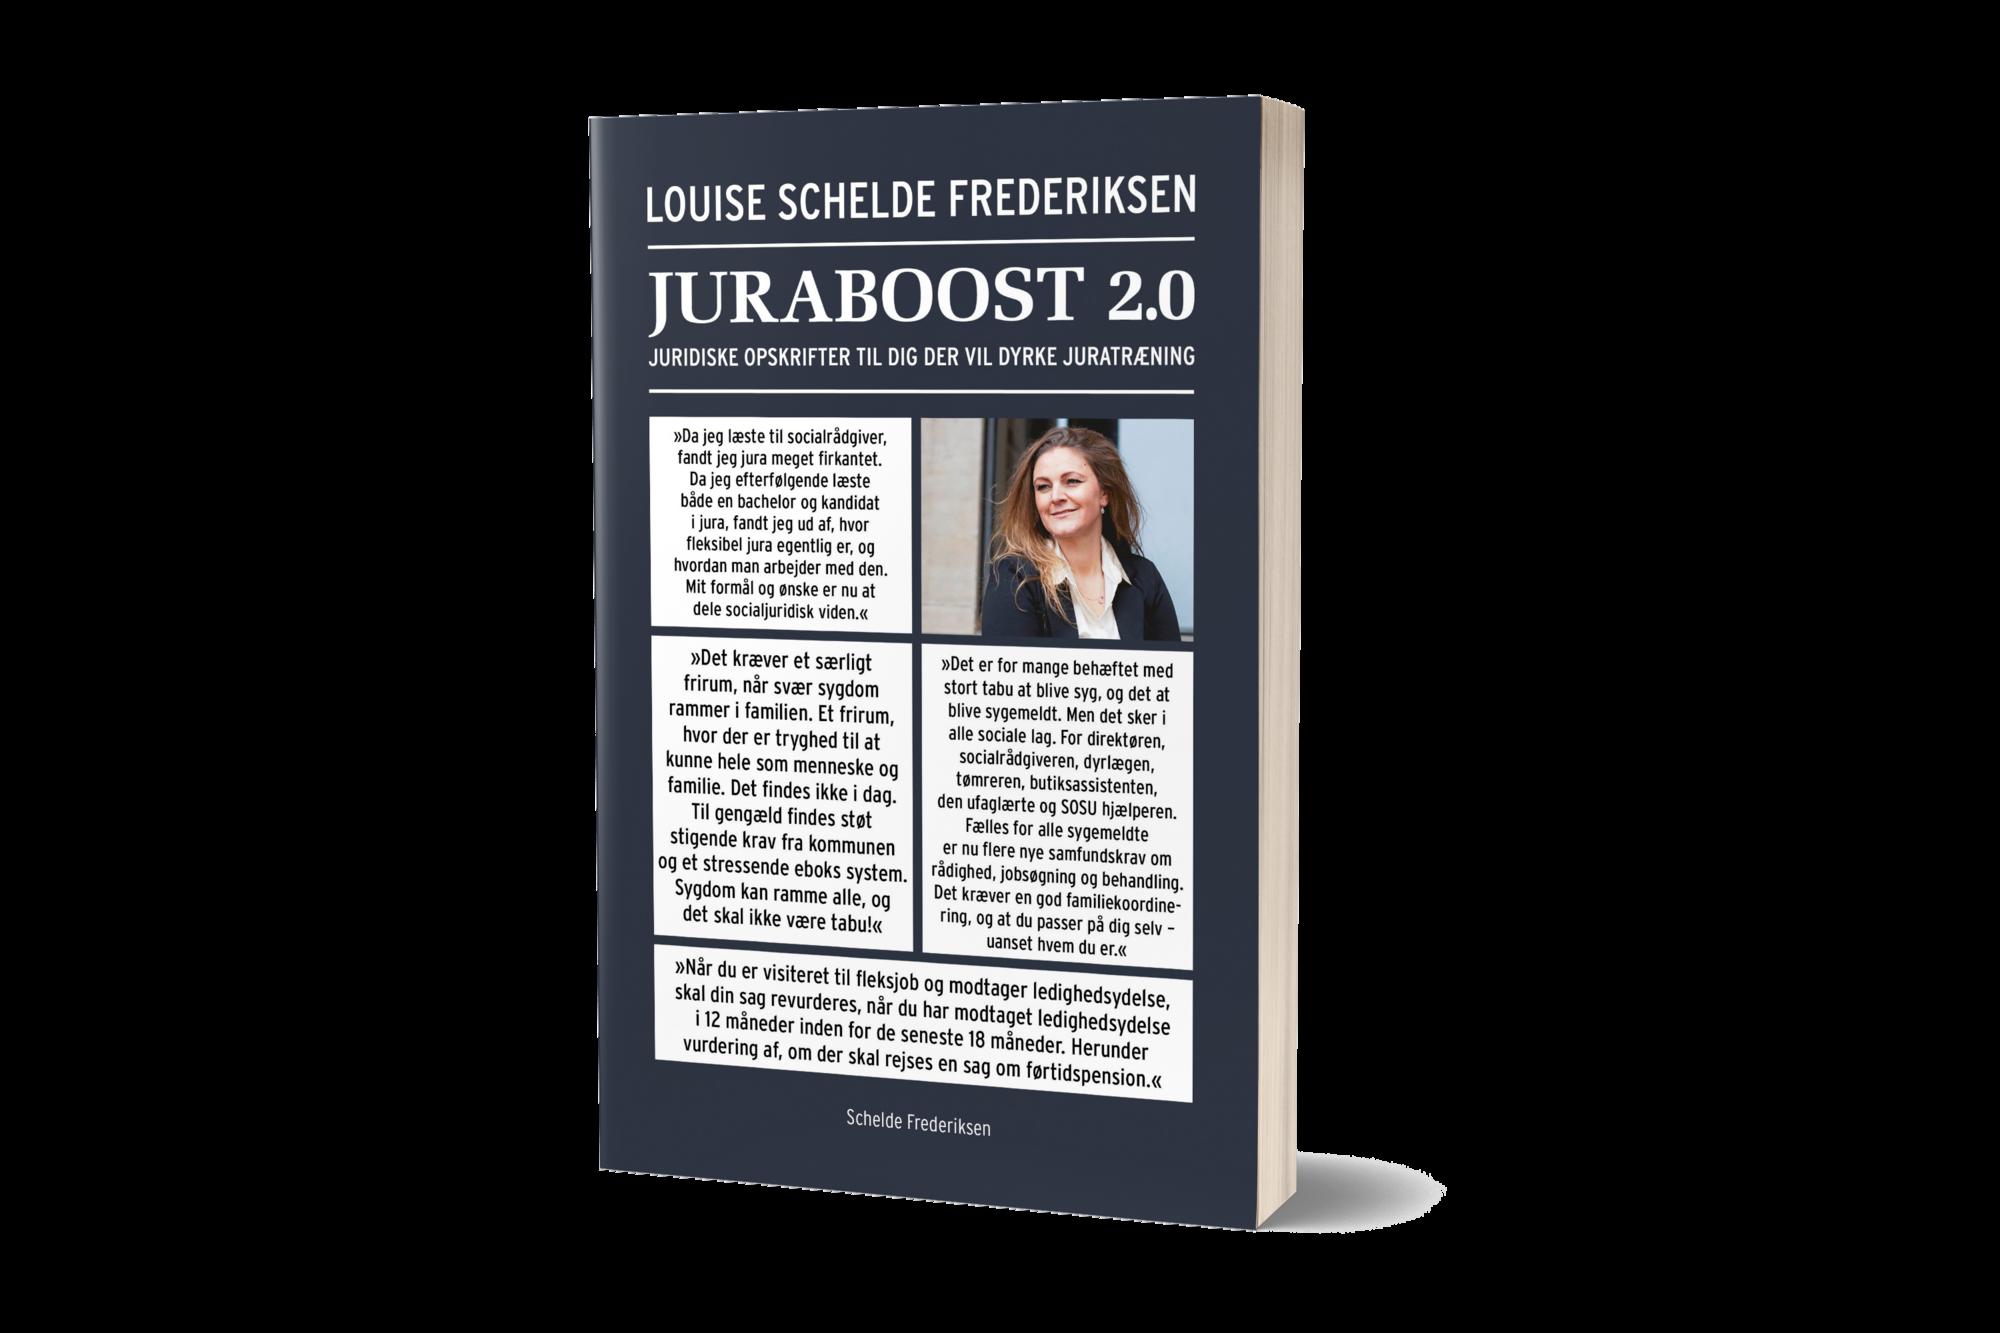 juraboost2